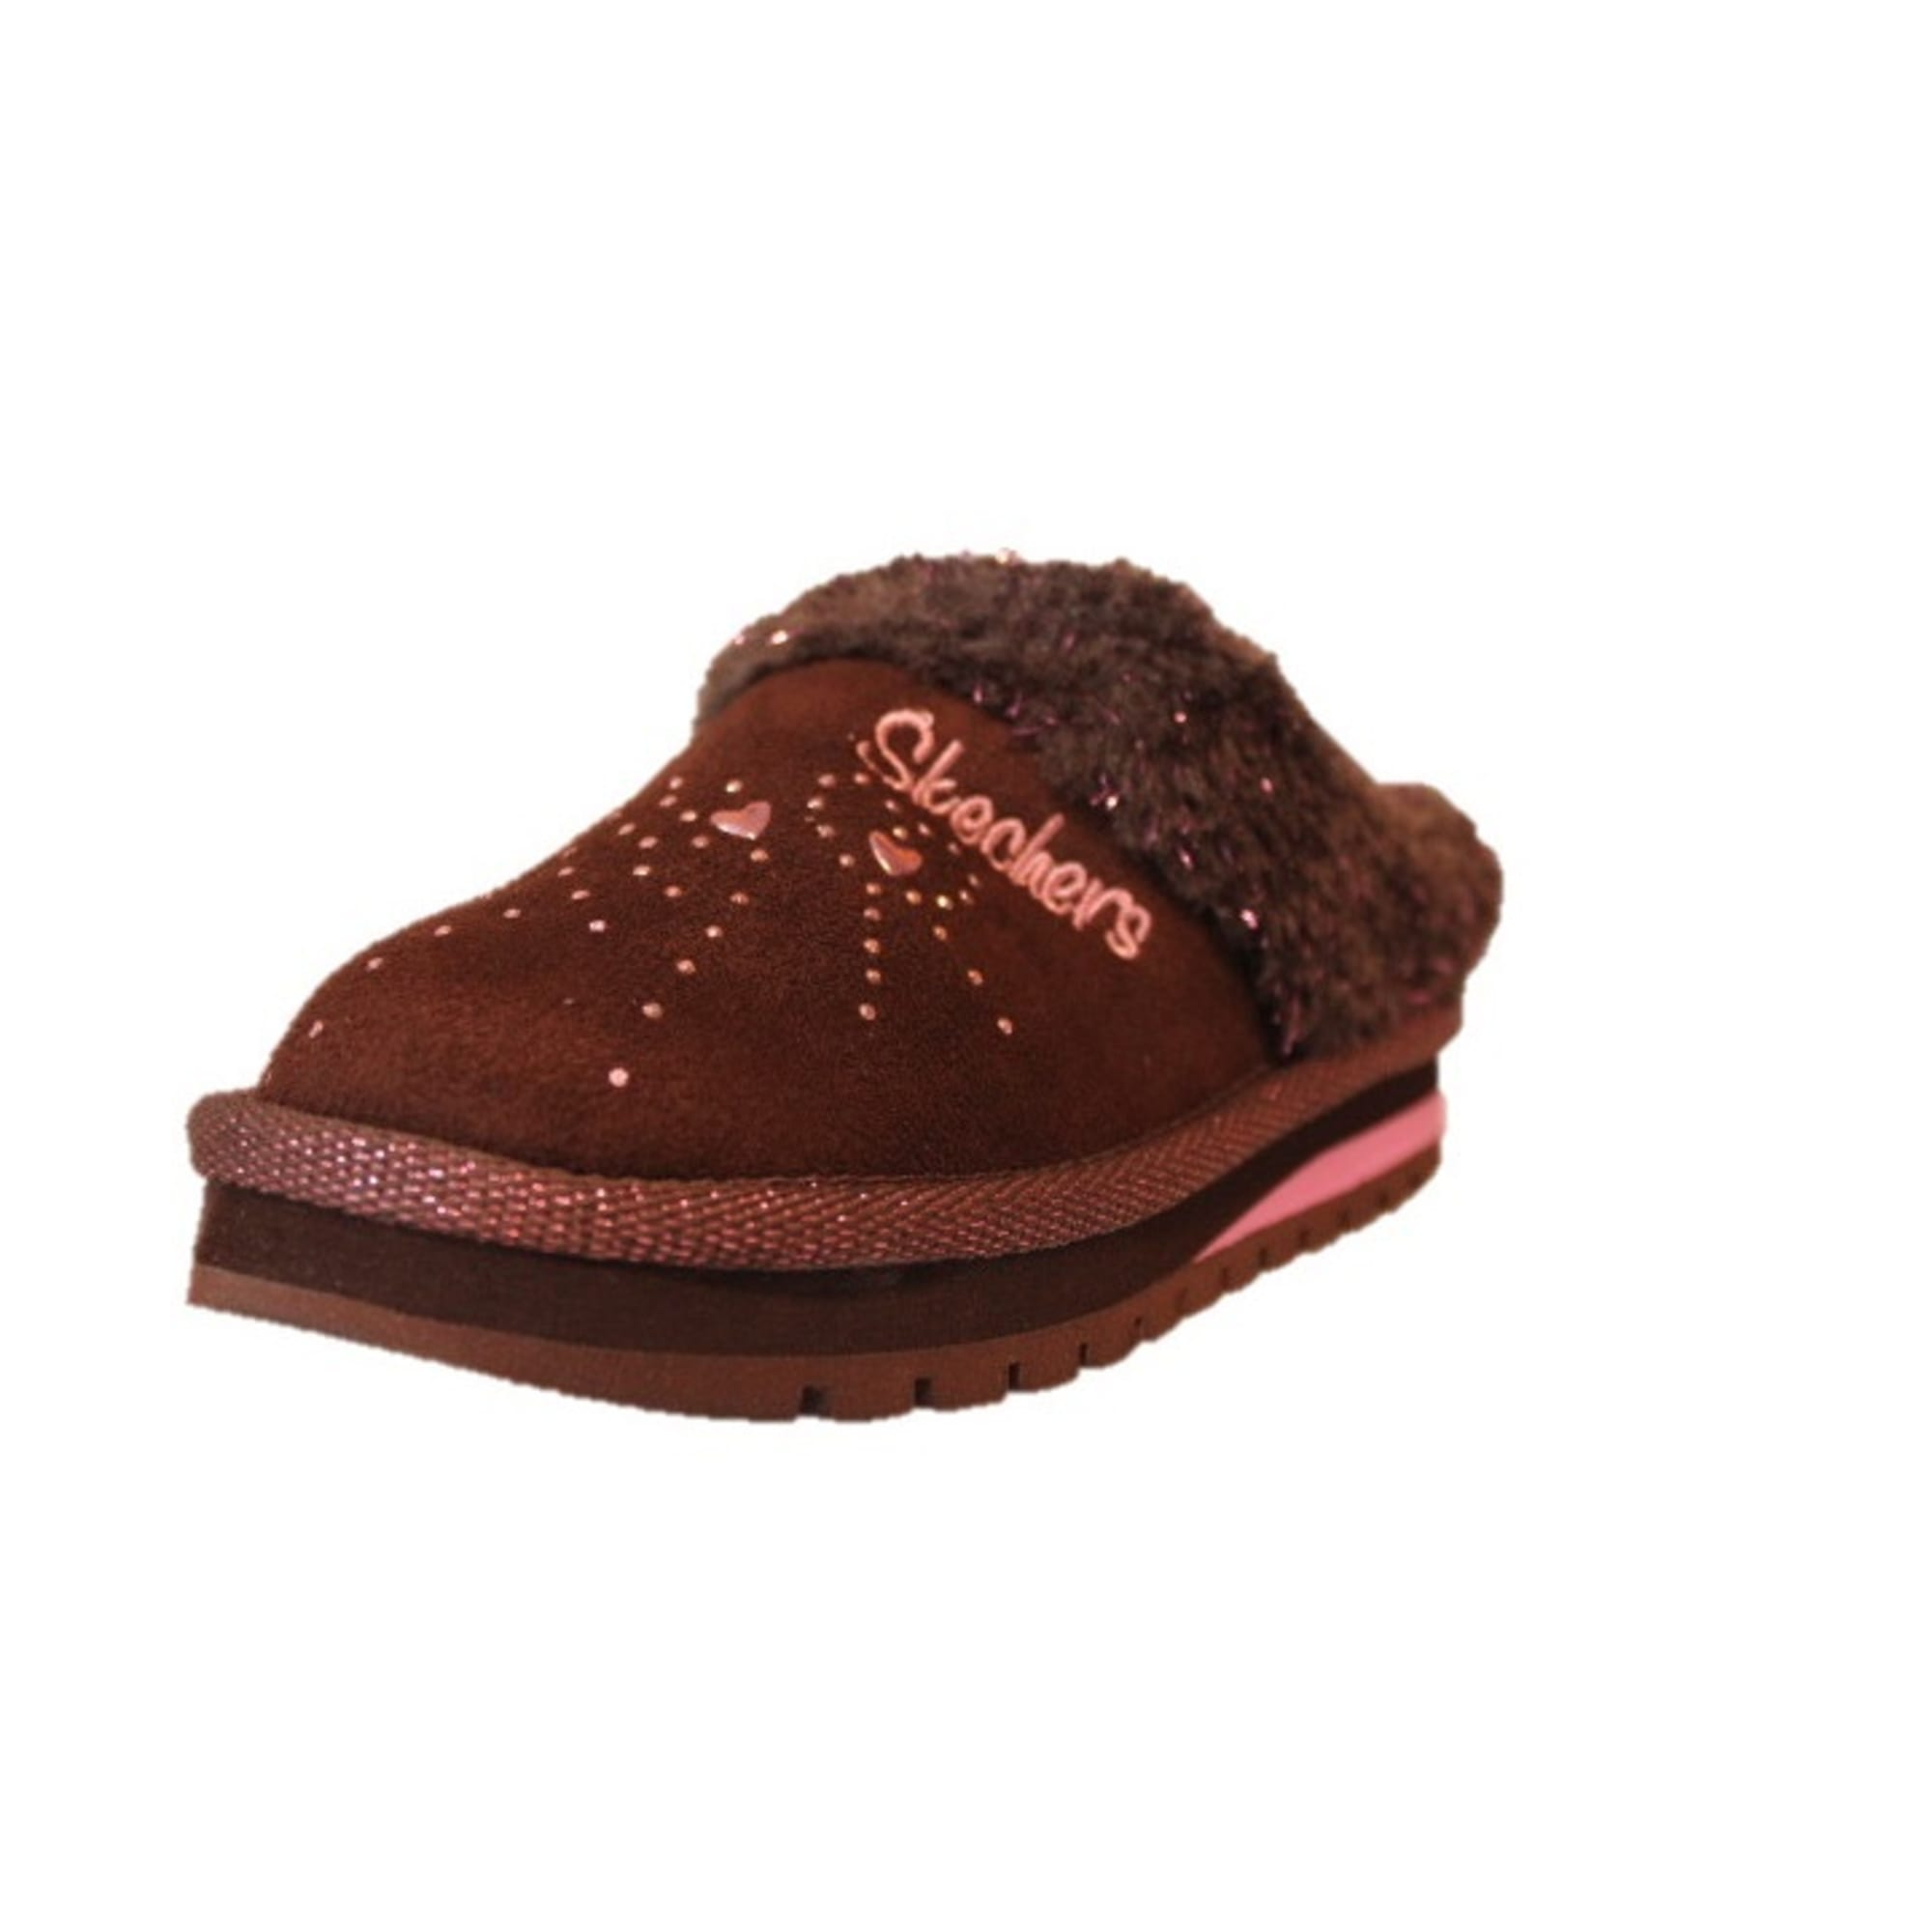 149820e32b7 Chaussons   pantoufles SKECHERS 28 marron - 6960887